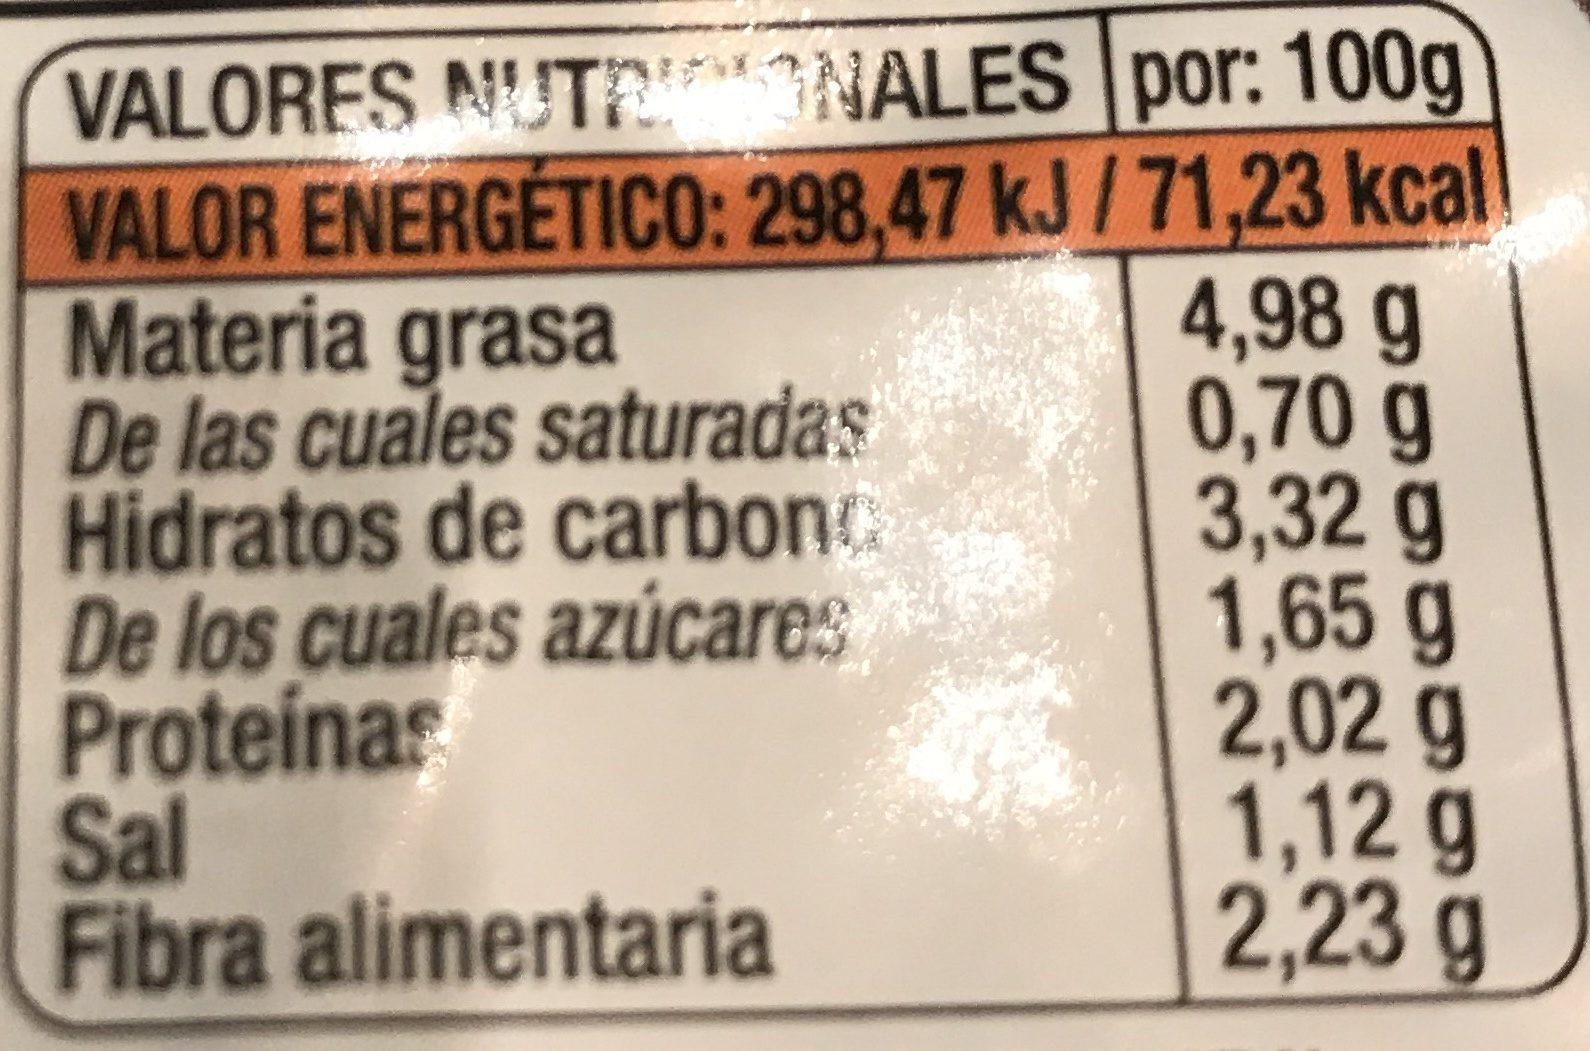 Burguesana quinoa y brocoli - Informació nutricional